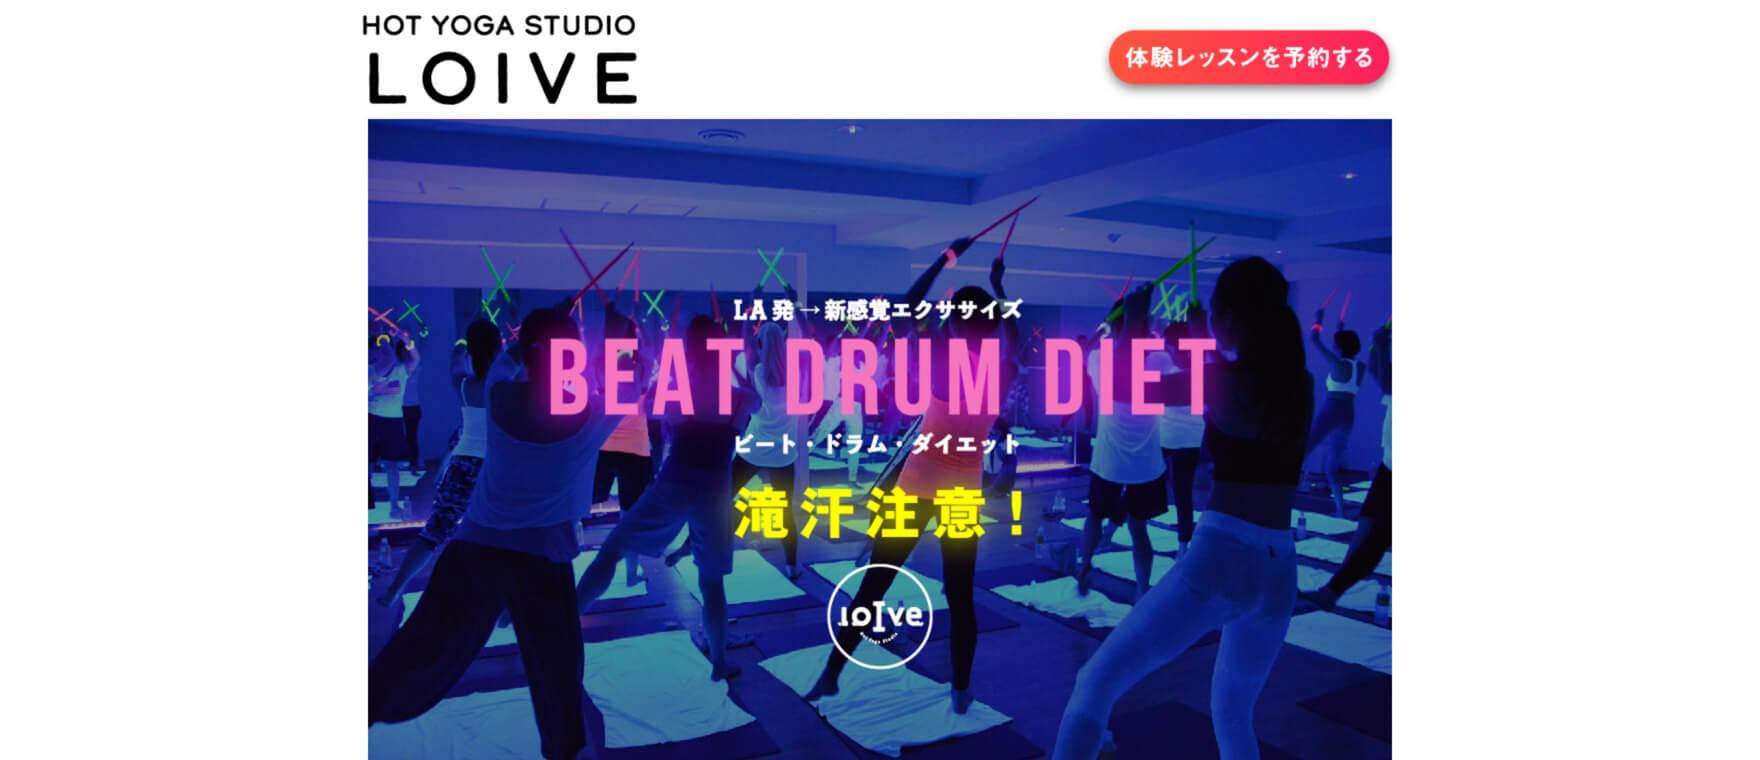 loIve仙台店のイメージ画像